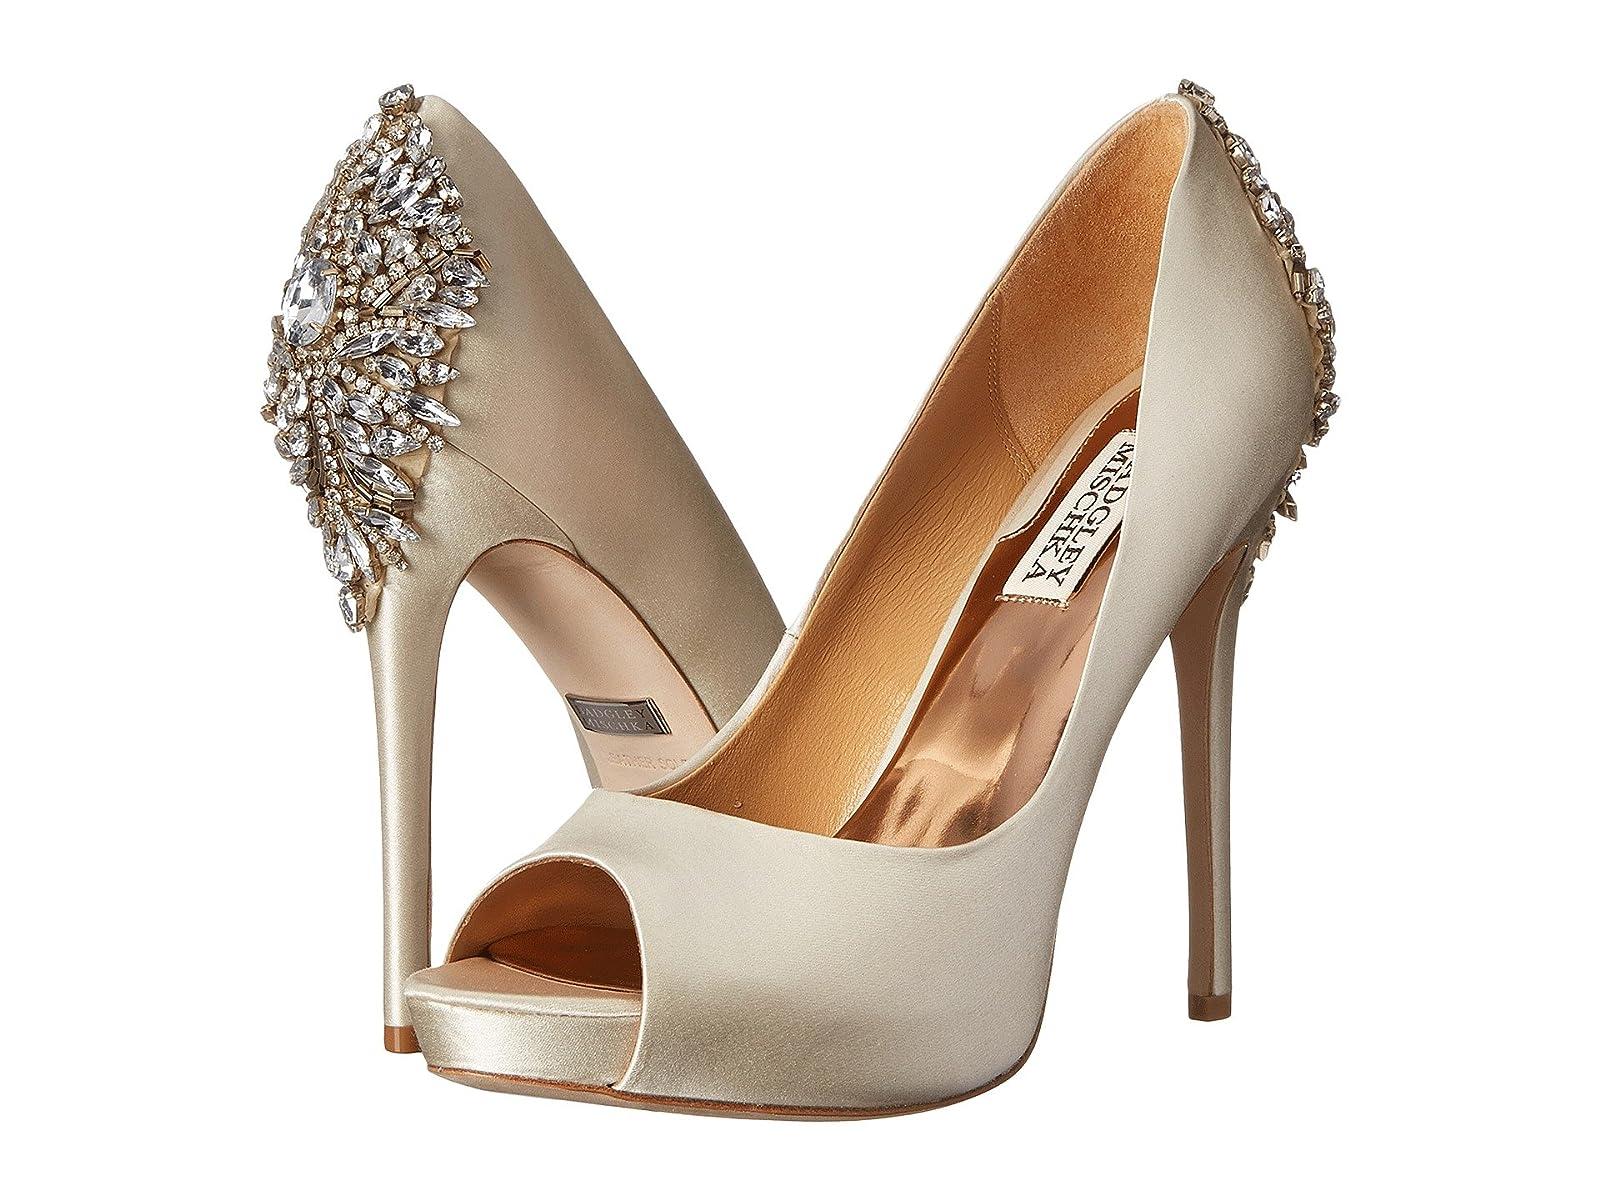 Badgley Mischka KiaraCheap and distinctive eye-catching shoes